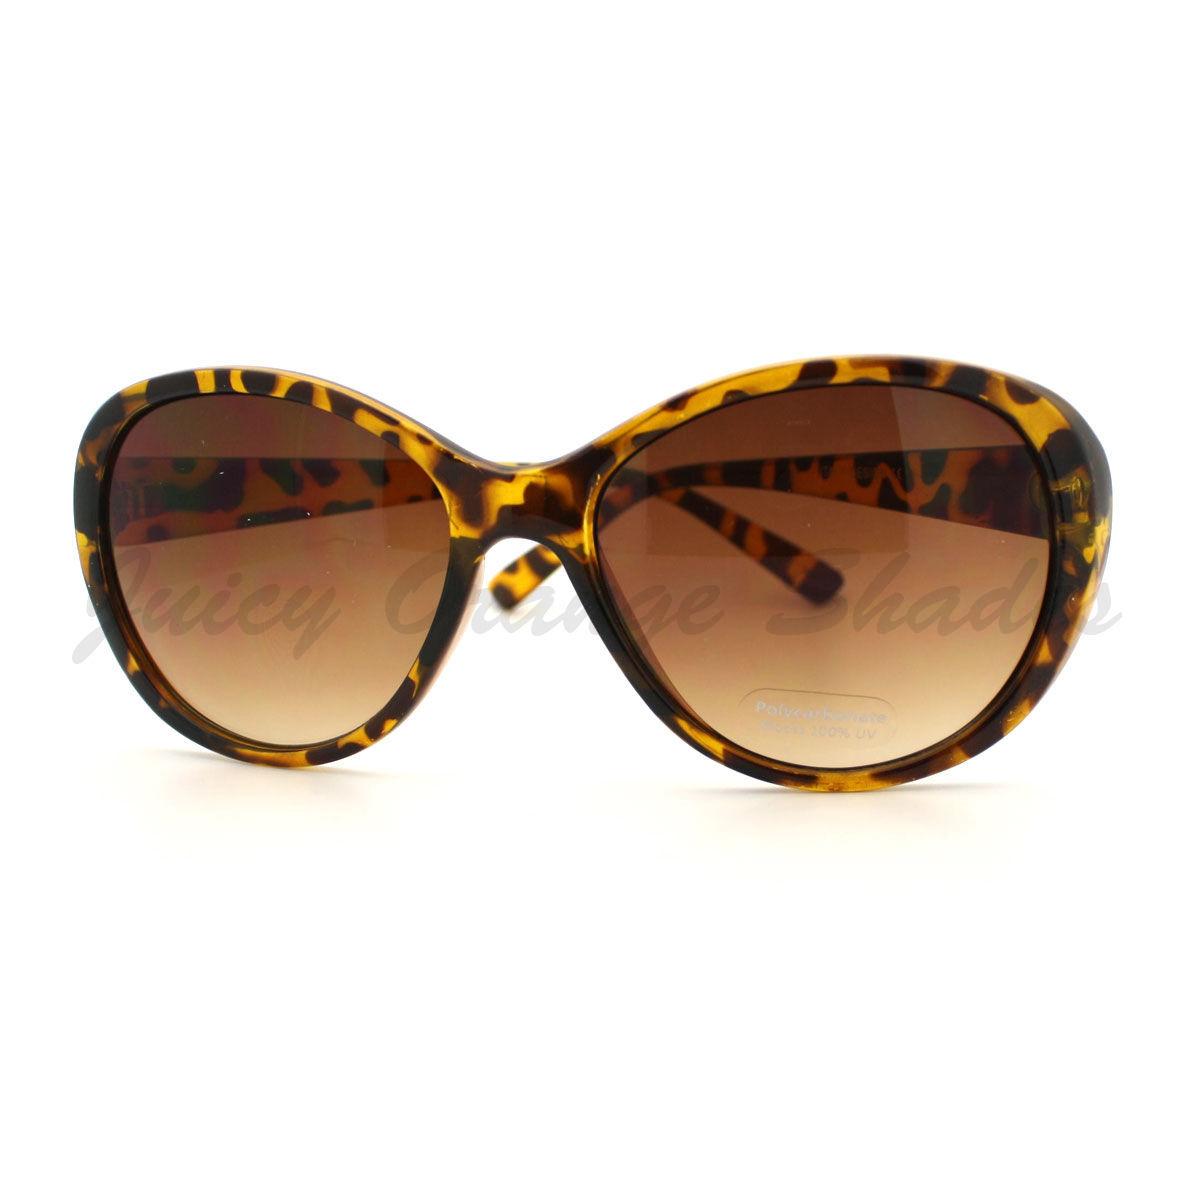 Womens Classic Fashion Sunglasses Simple Stylish Vintage Eyewear